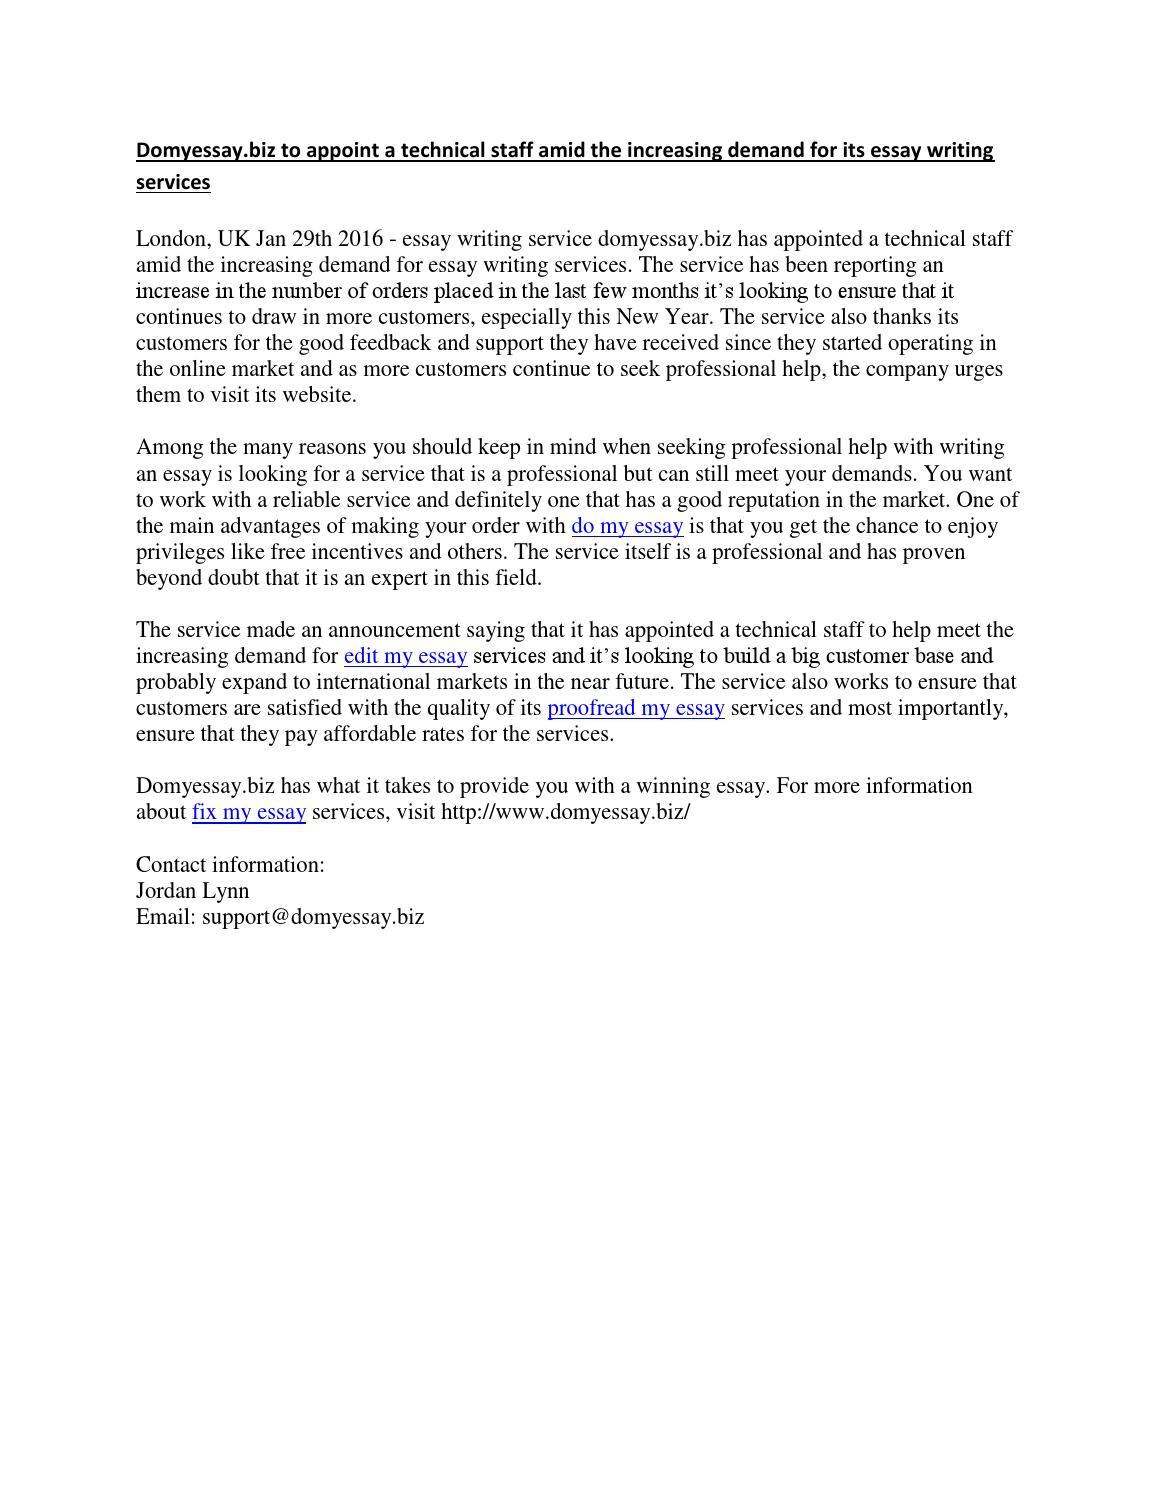 018 Essay Example Page 1 Fix Singular My Generator Free Title Online Full